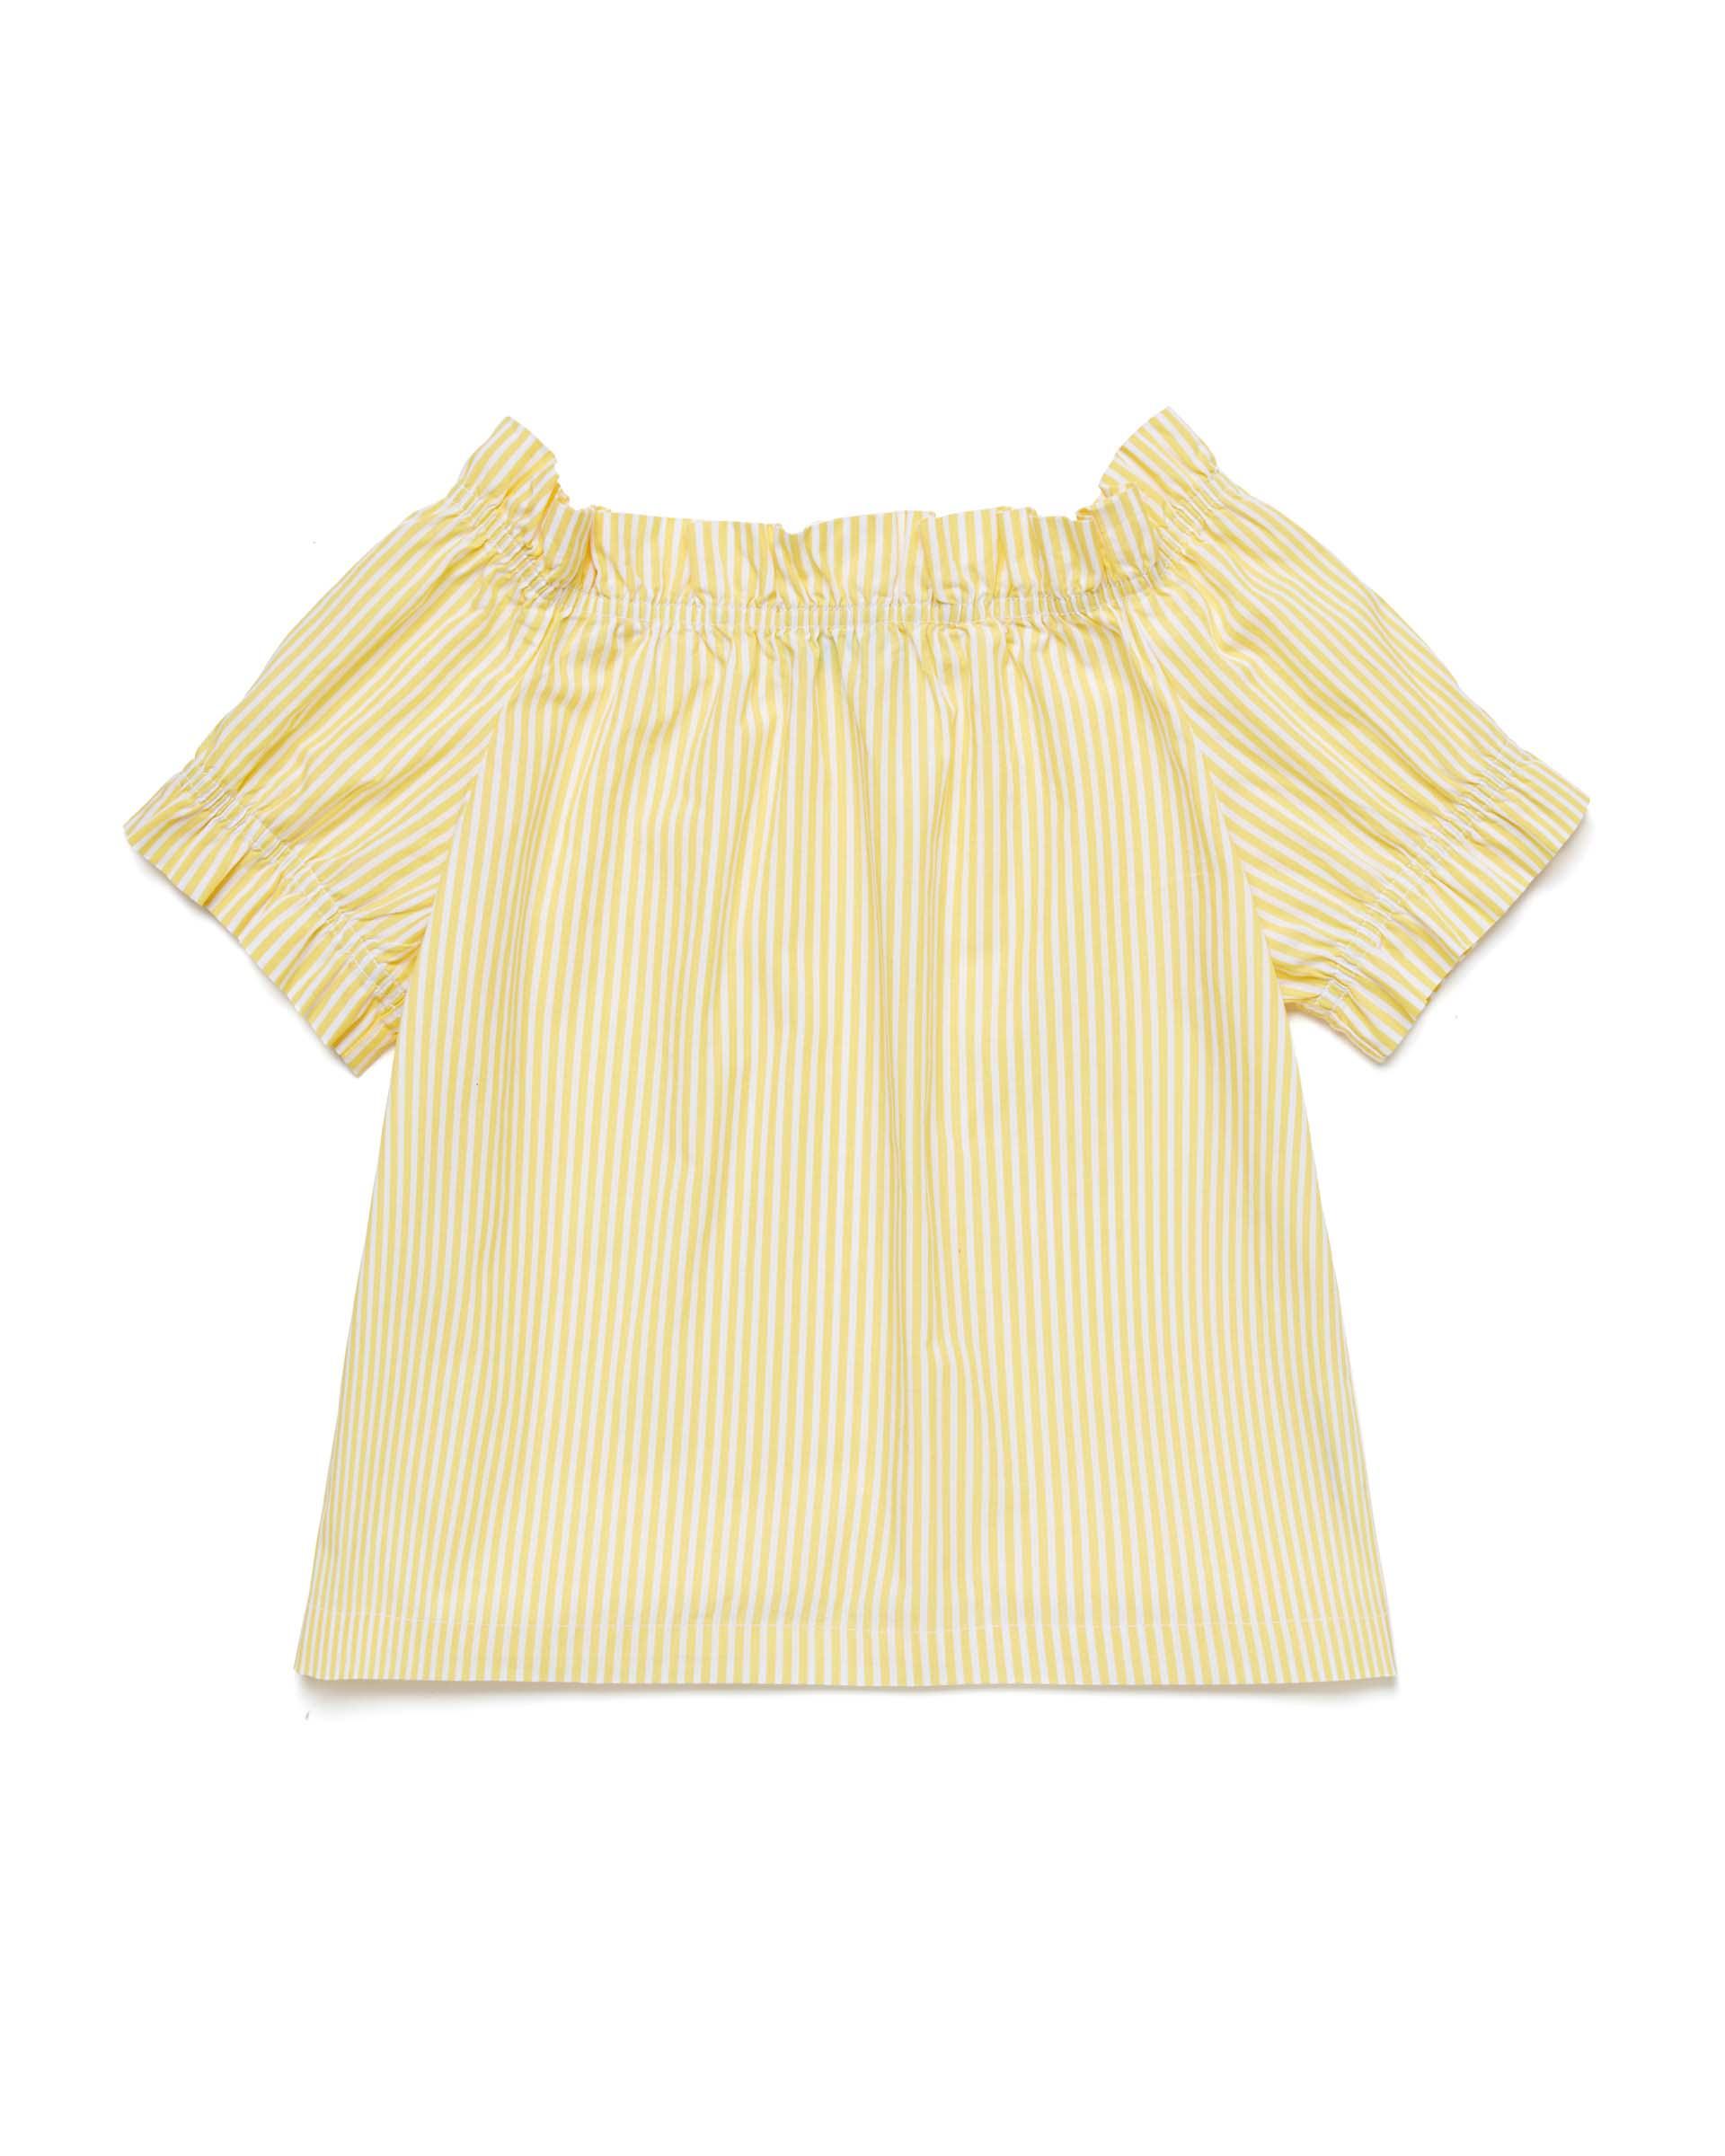 Купить 20P_5OT65QH40_902, Блуза для девочек Benetton 5OT65QH40_902 р-р 158, United Colors of Benetton, Блузки для девочек